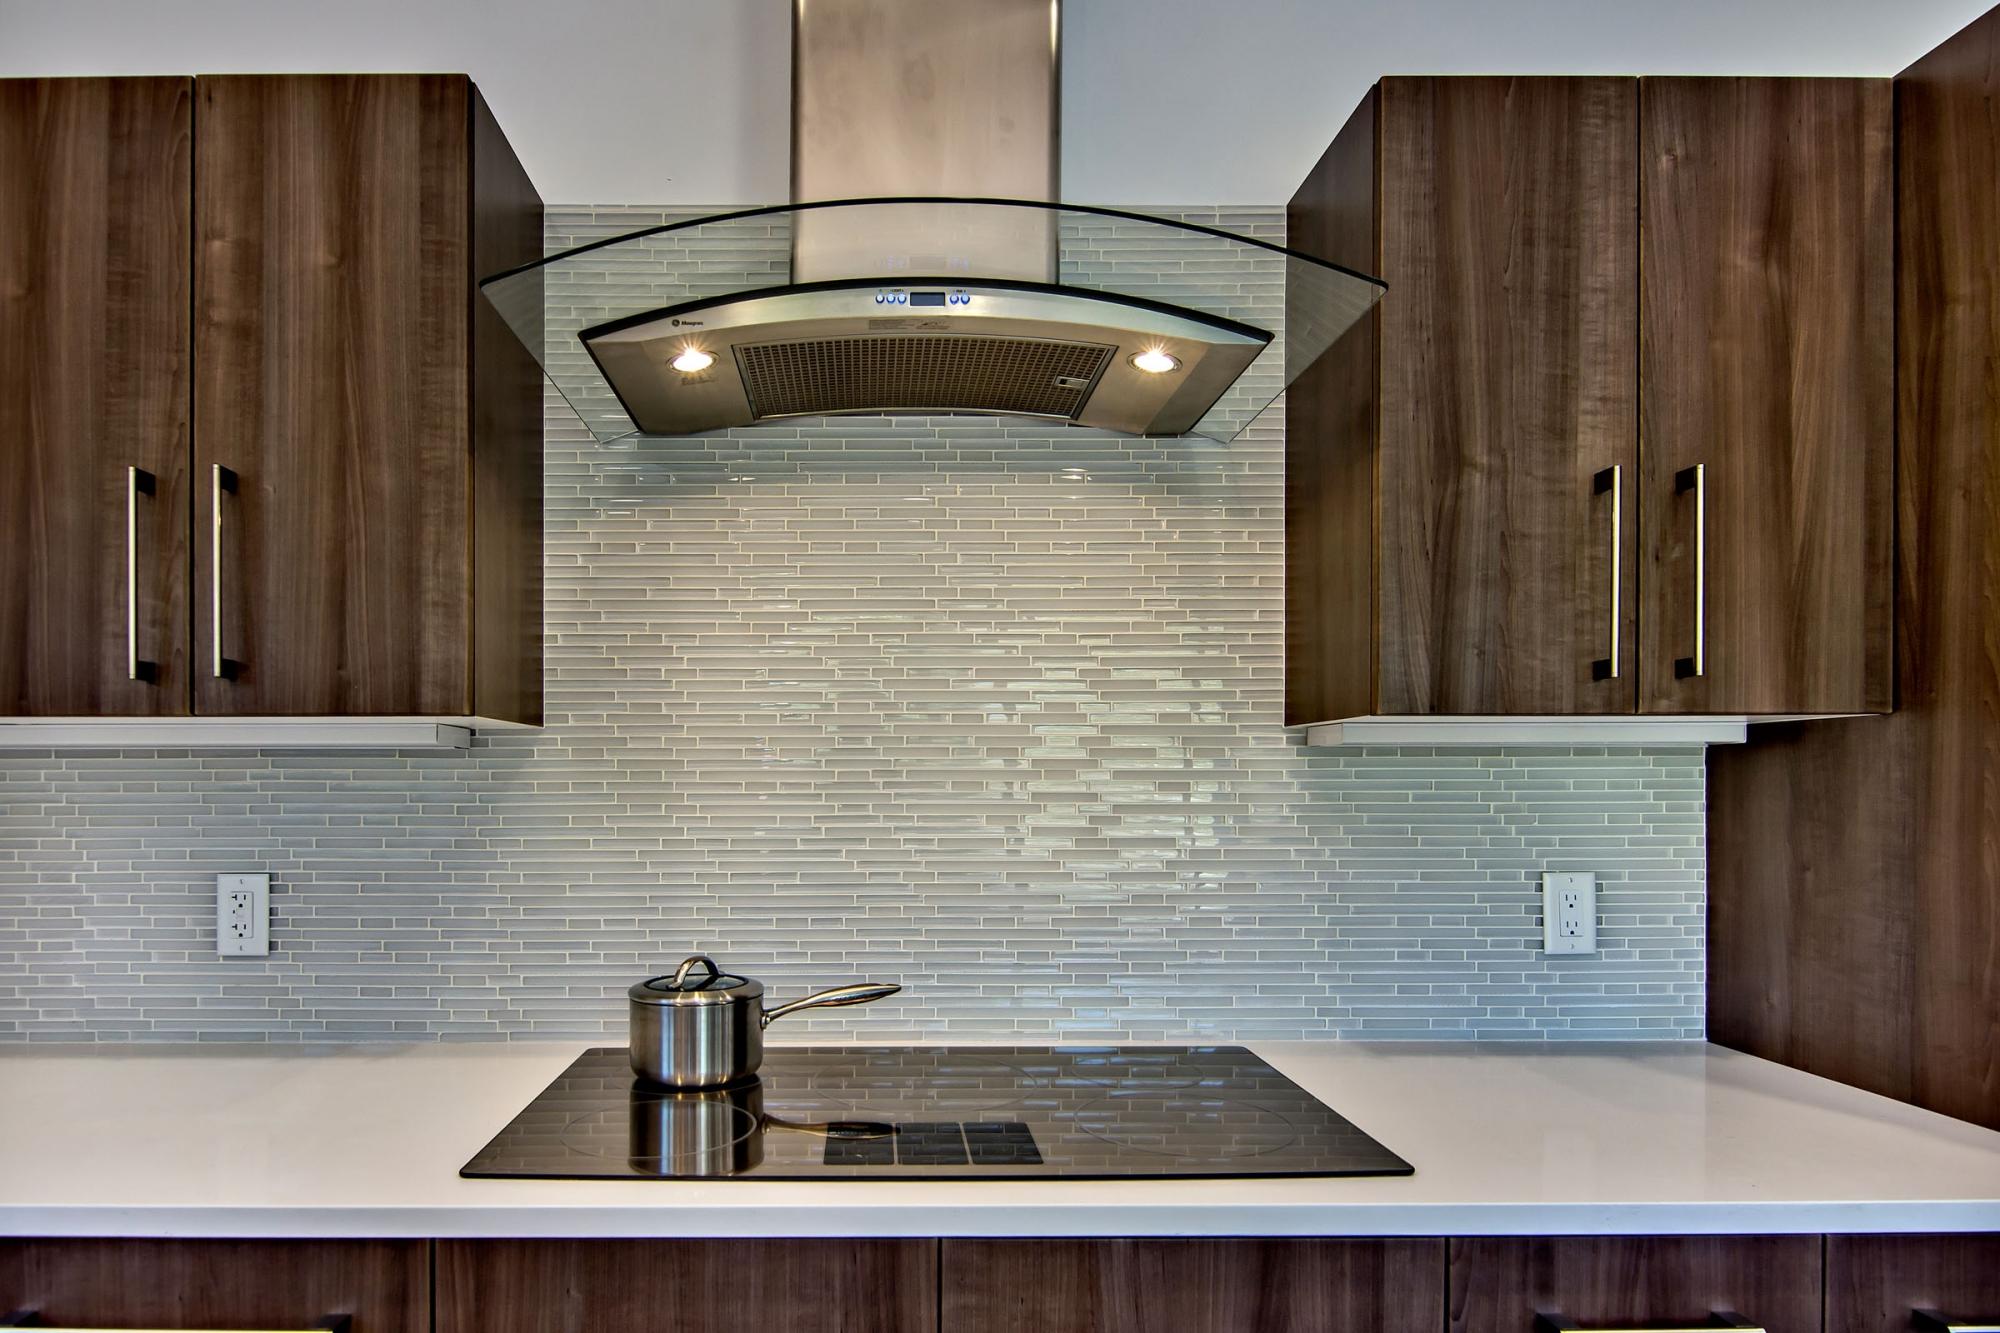 glass backsplashes for kitchens rv kitchen sink lovely backsplash the important design